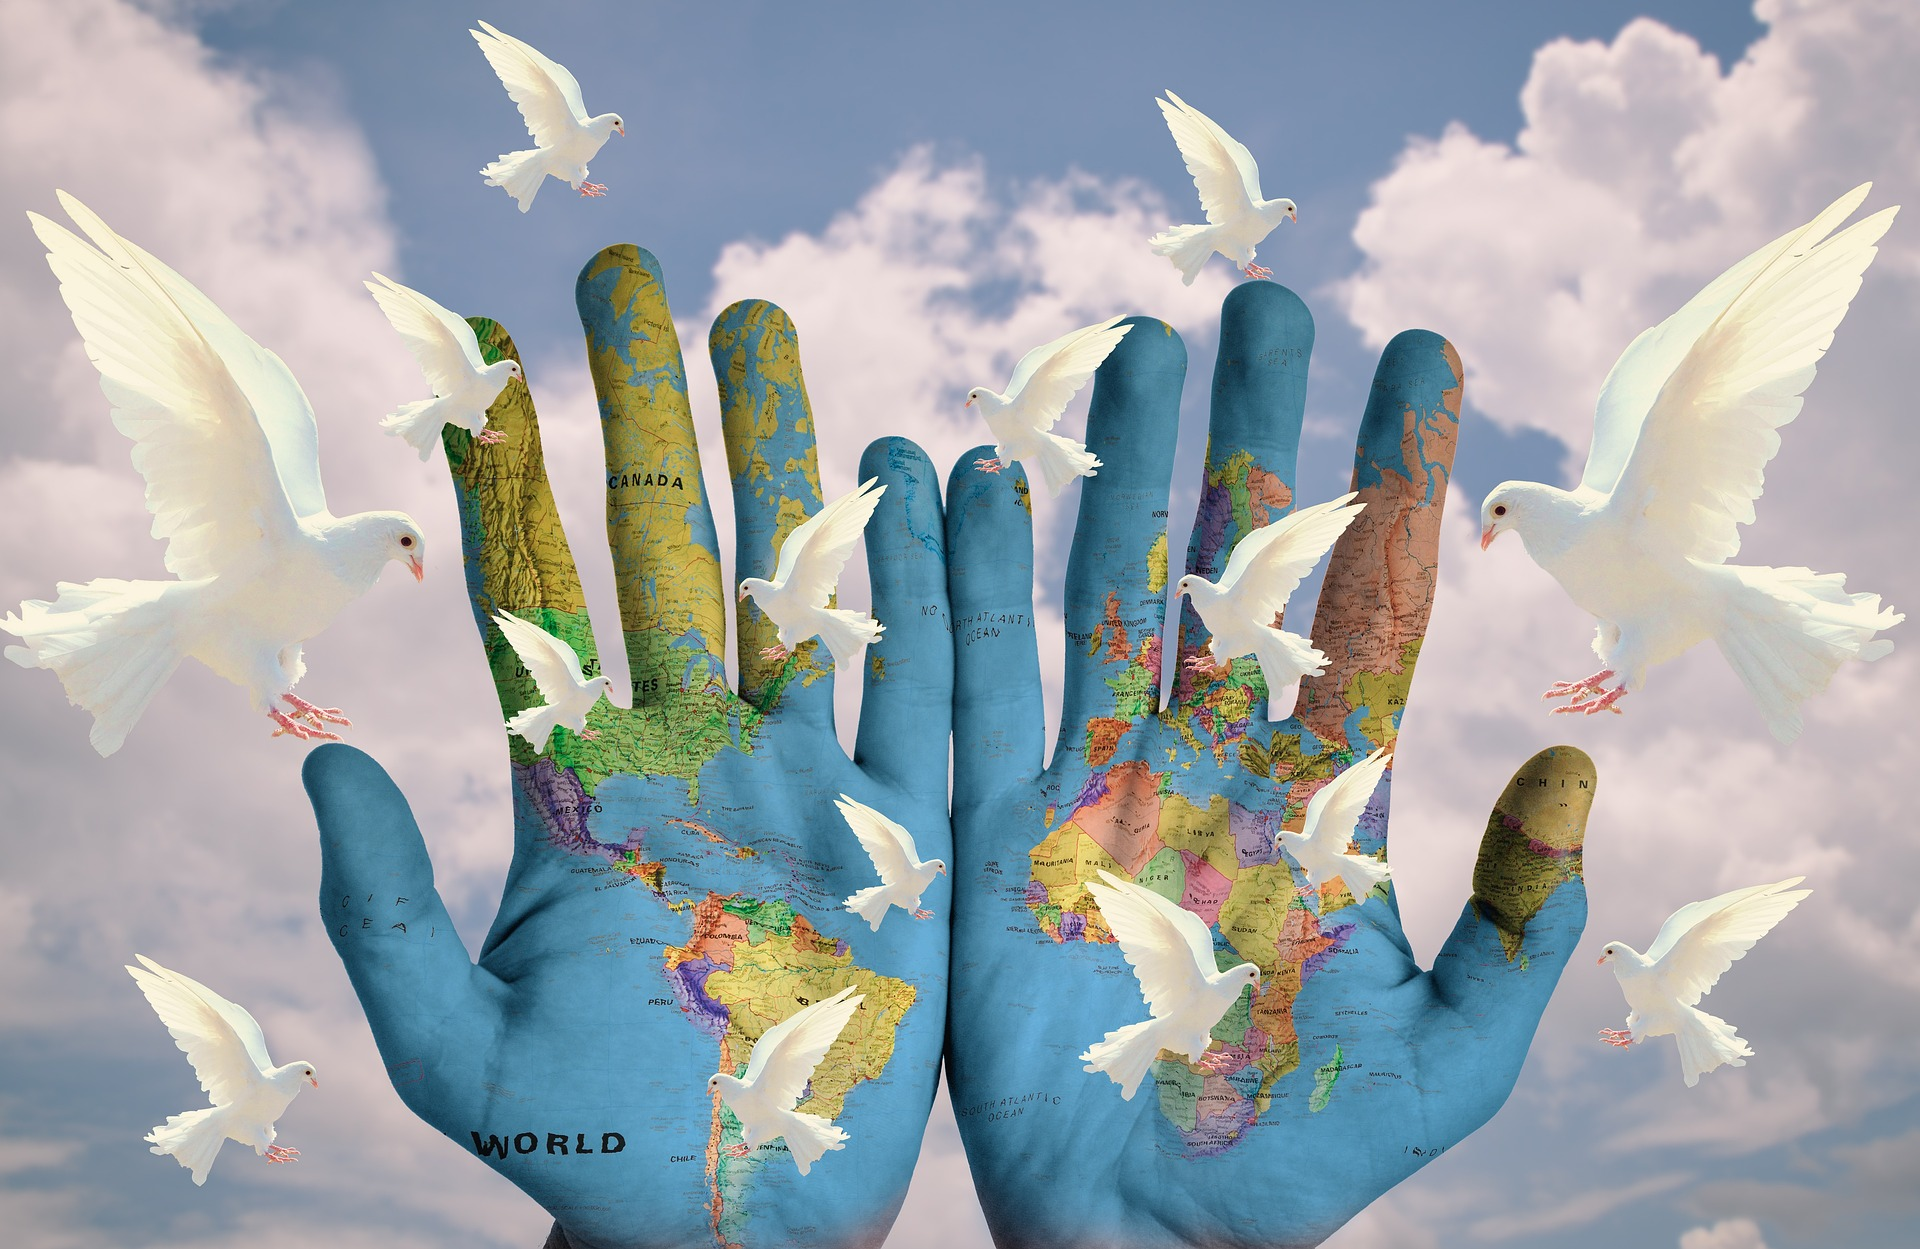 Metáfora de un mundo en armonía. Imagen de S. Hermann & F. Richter en Pixabay